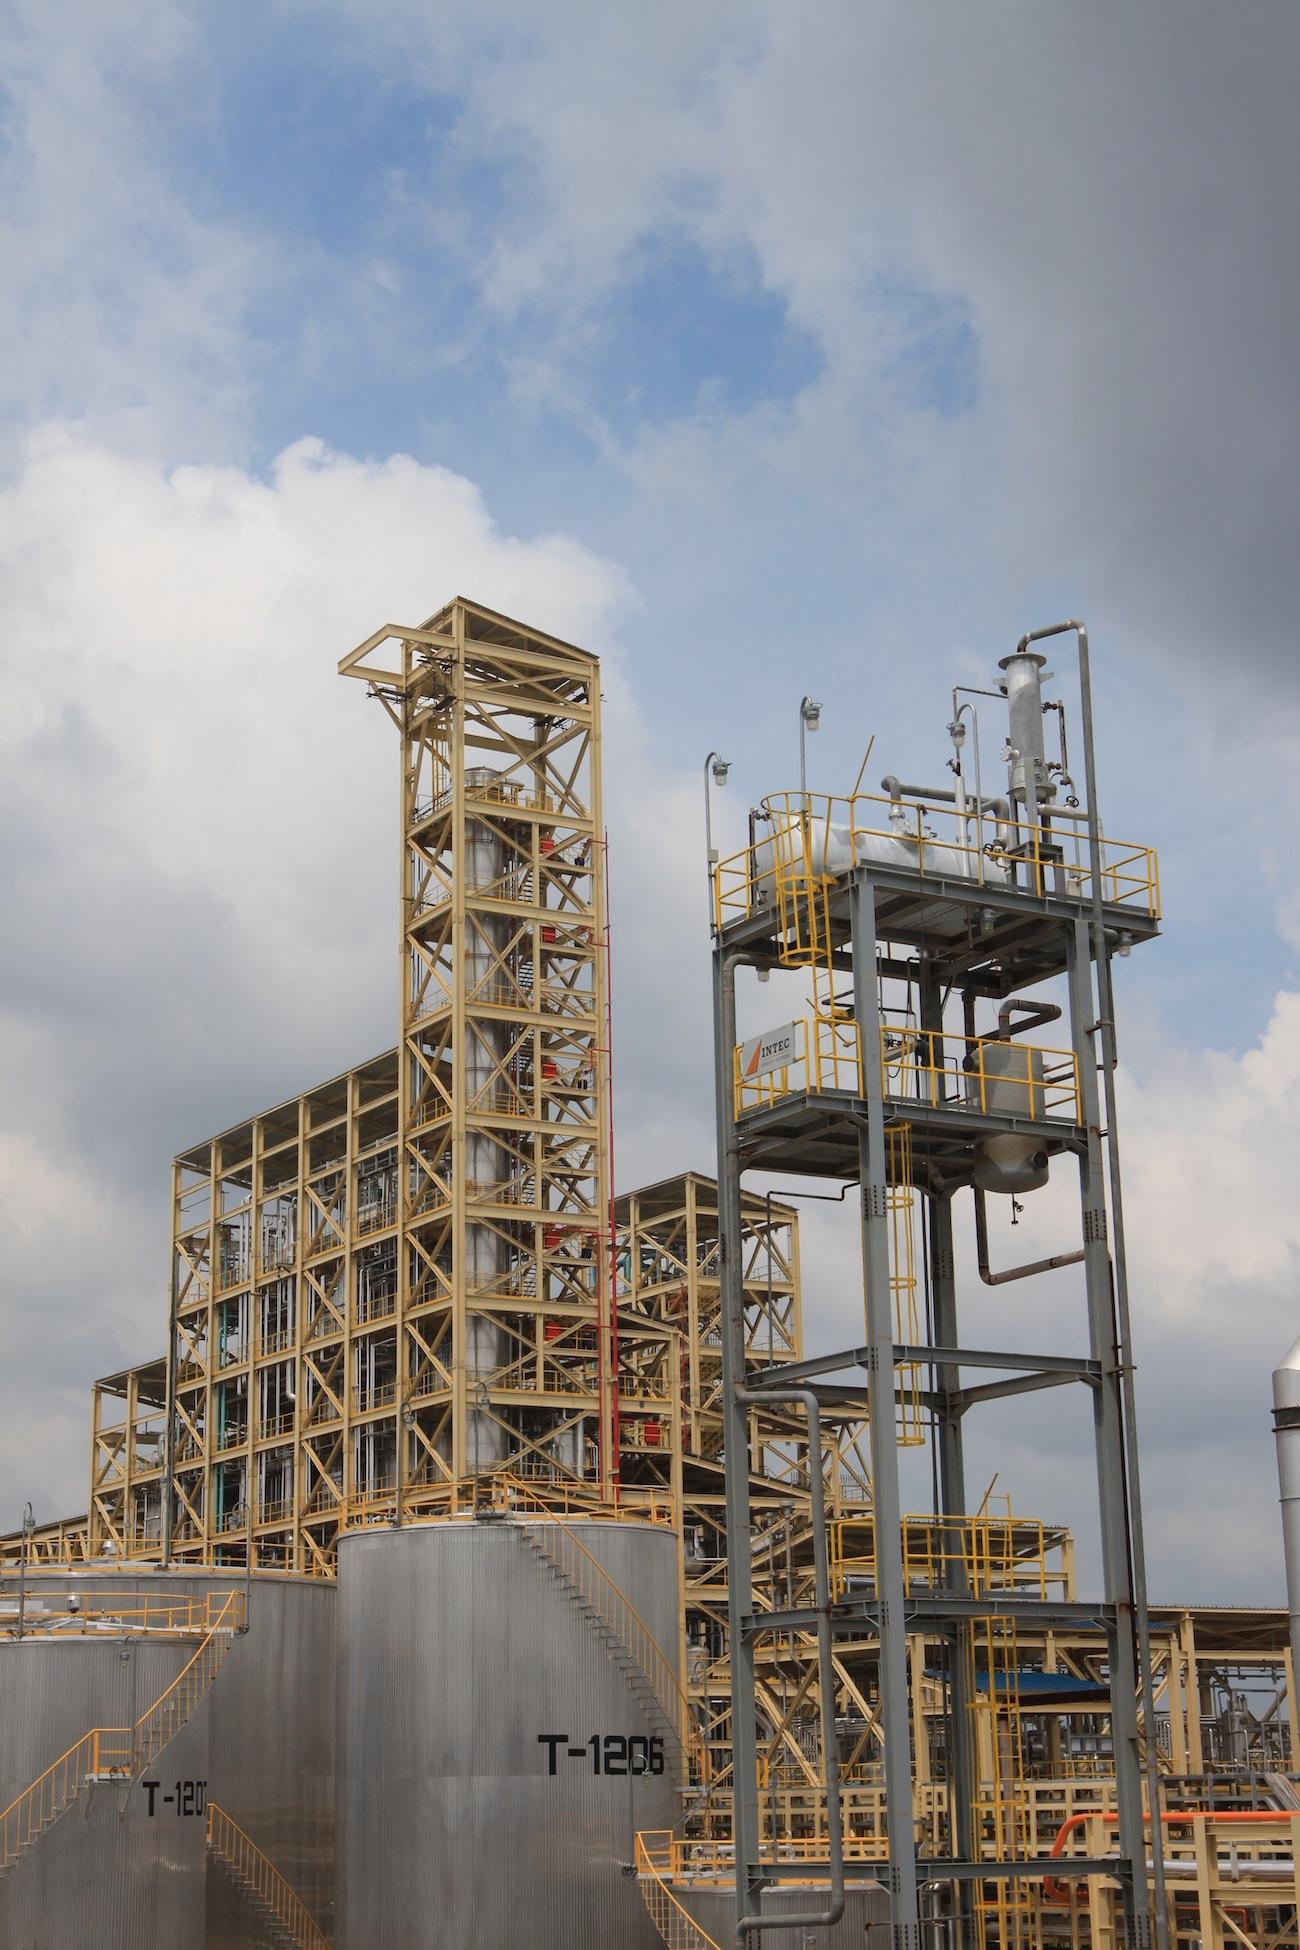 Sinar Mas Cepsa starts up production at eur 300 million